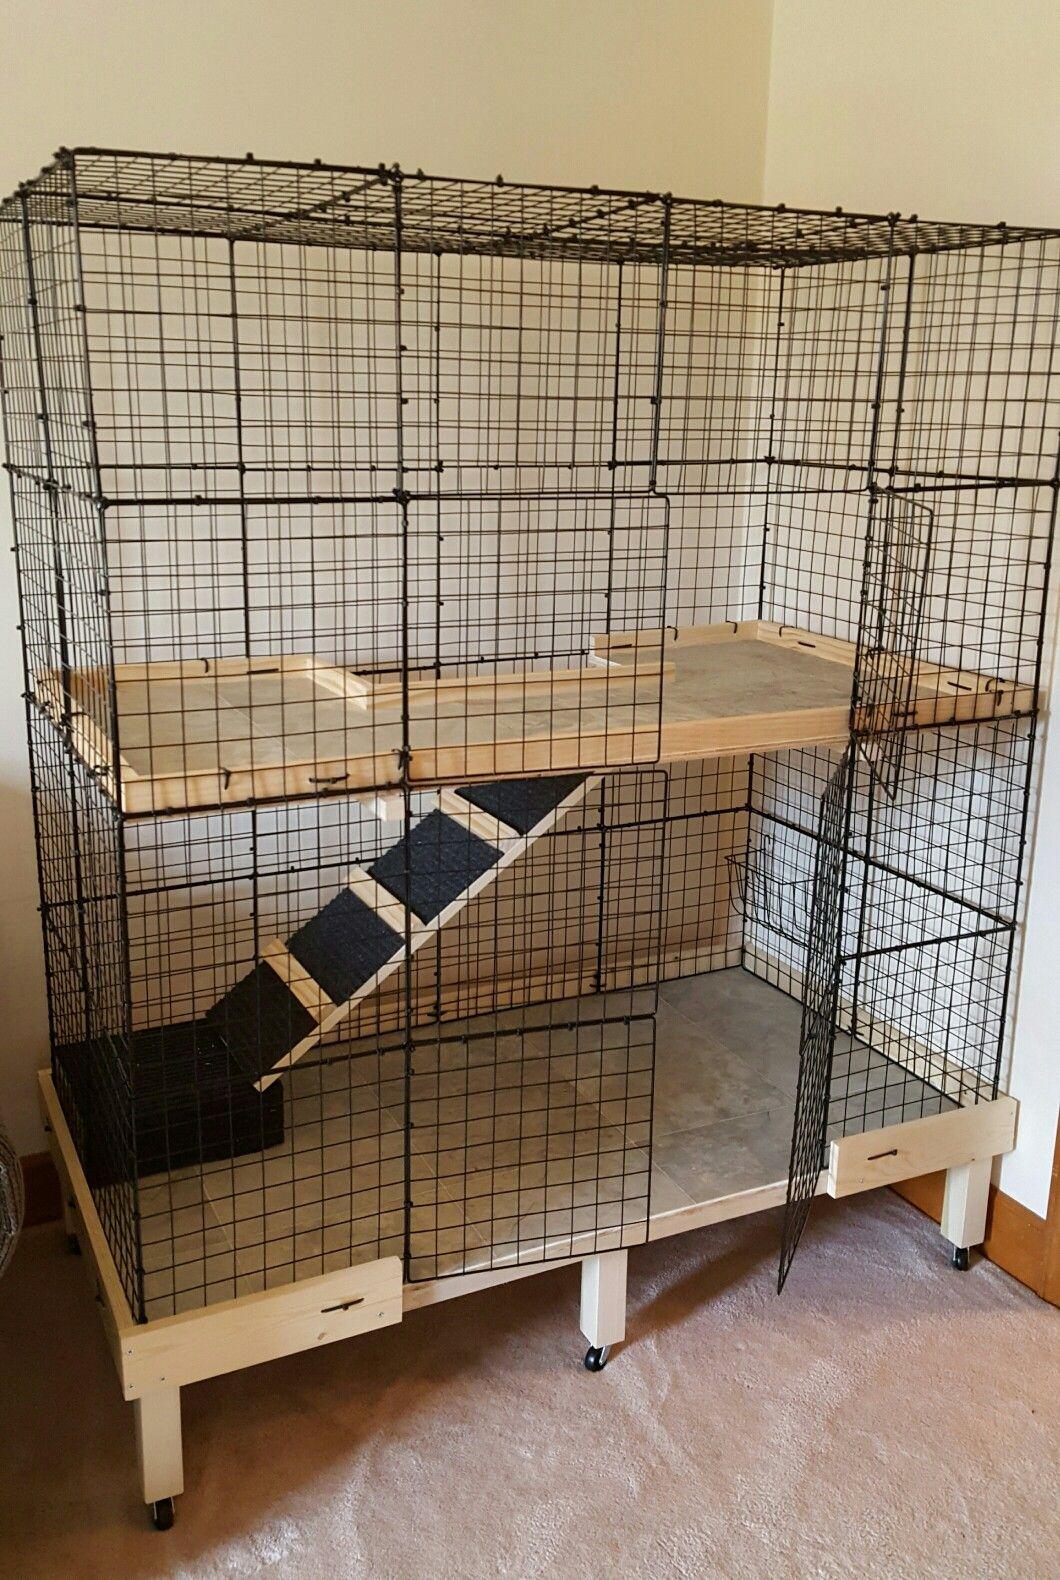 Homemade Flemish Giant Rabbit Cage Diy Rabbit Cage Pet Bunny Flemish Giant Rabbit